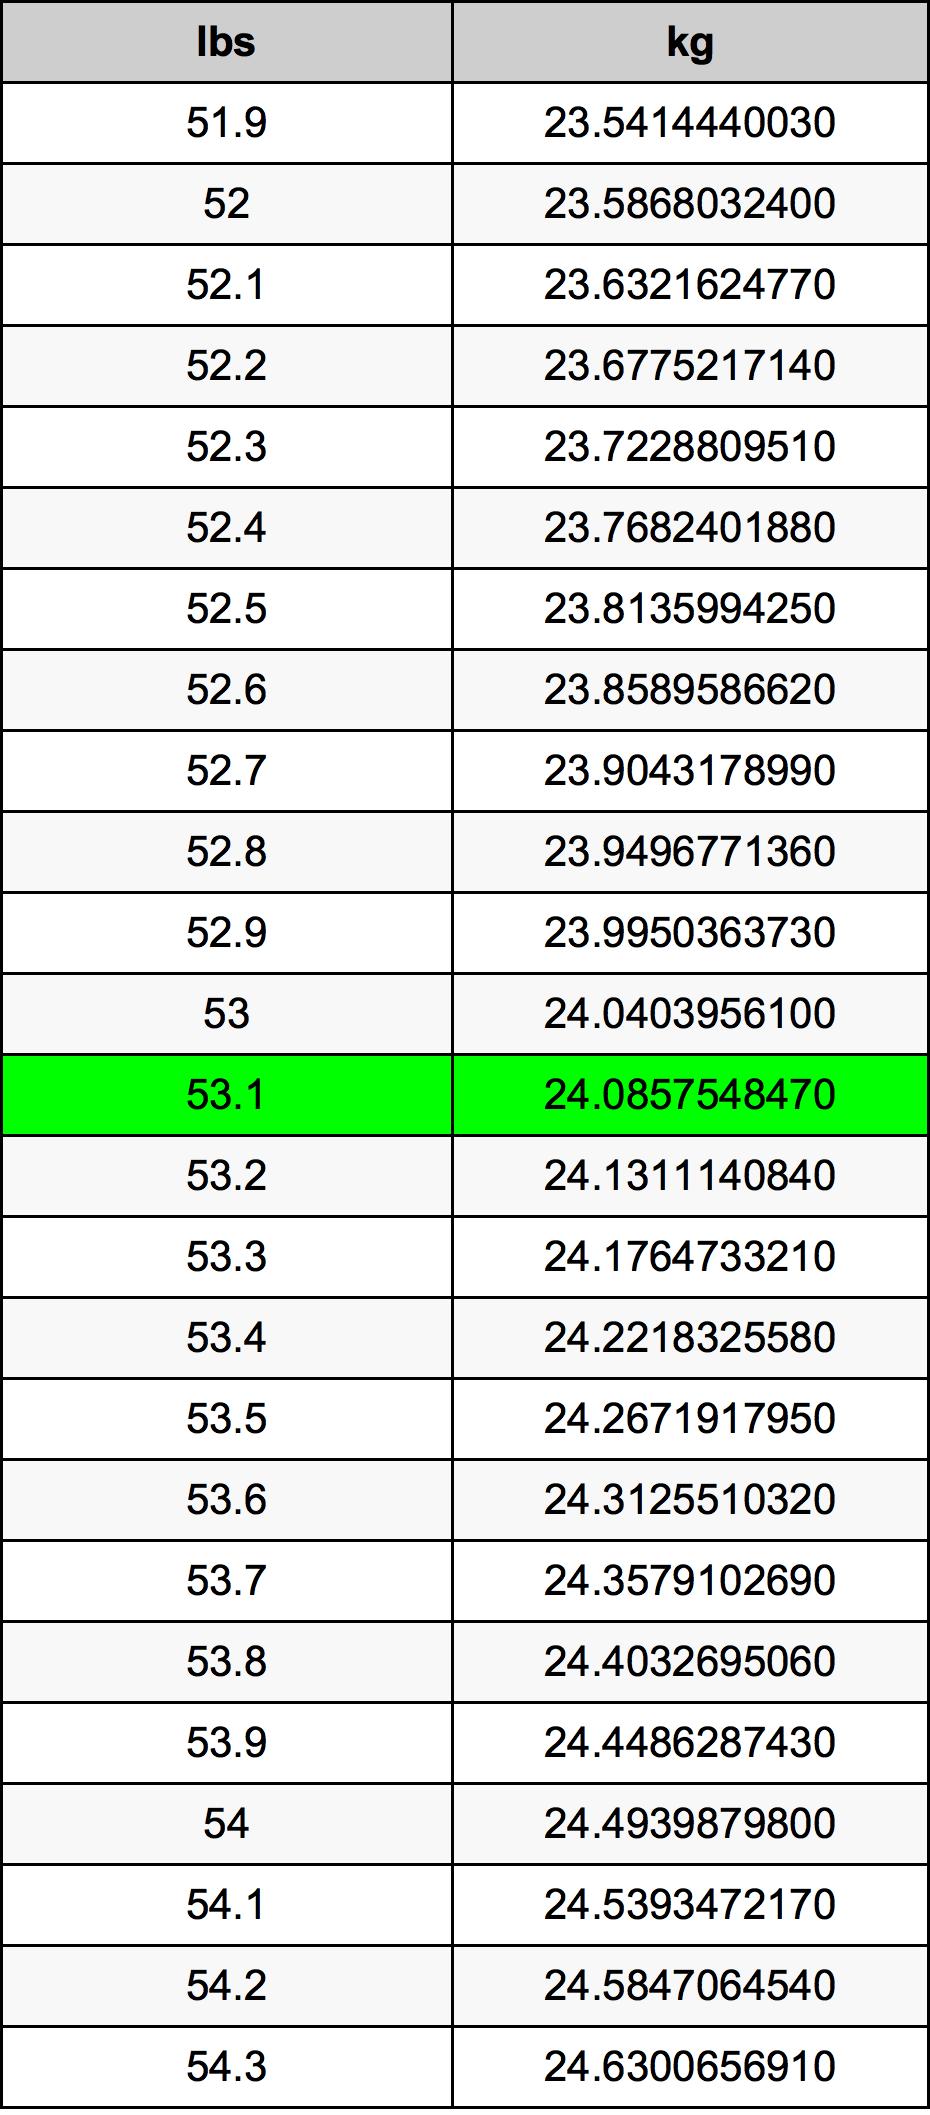 53.1 Pund konverteringstabell